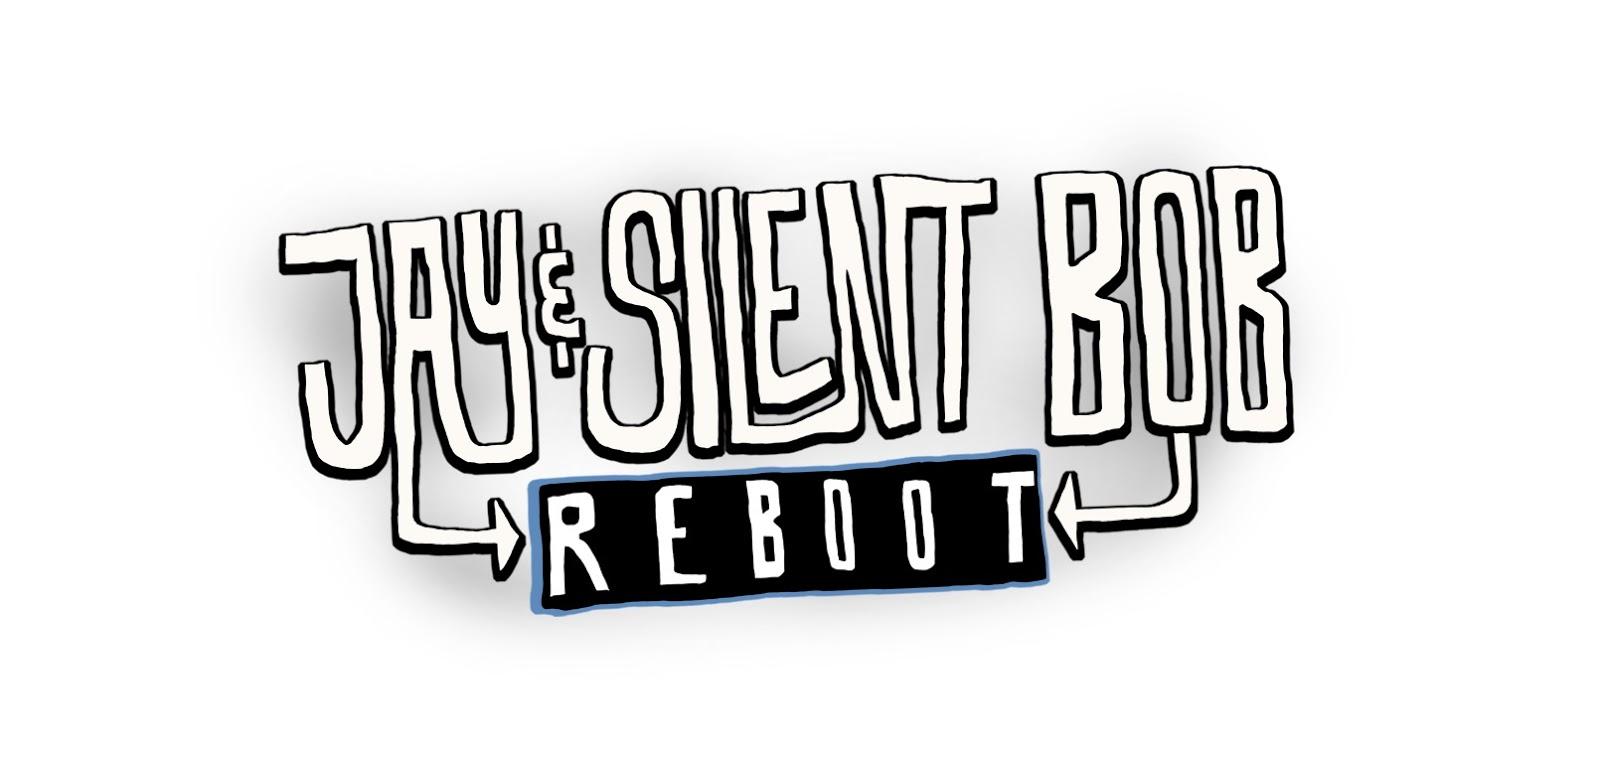 Jay and Silent Bob Reboot Movie Logo